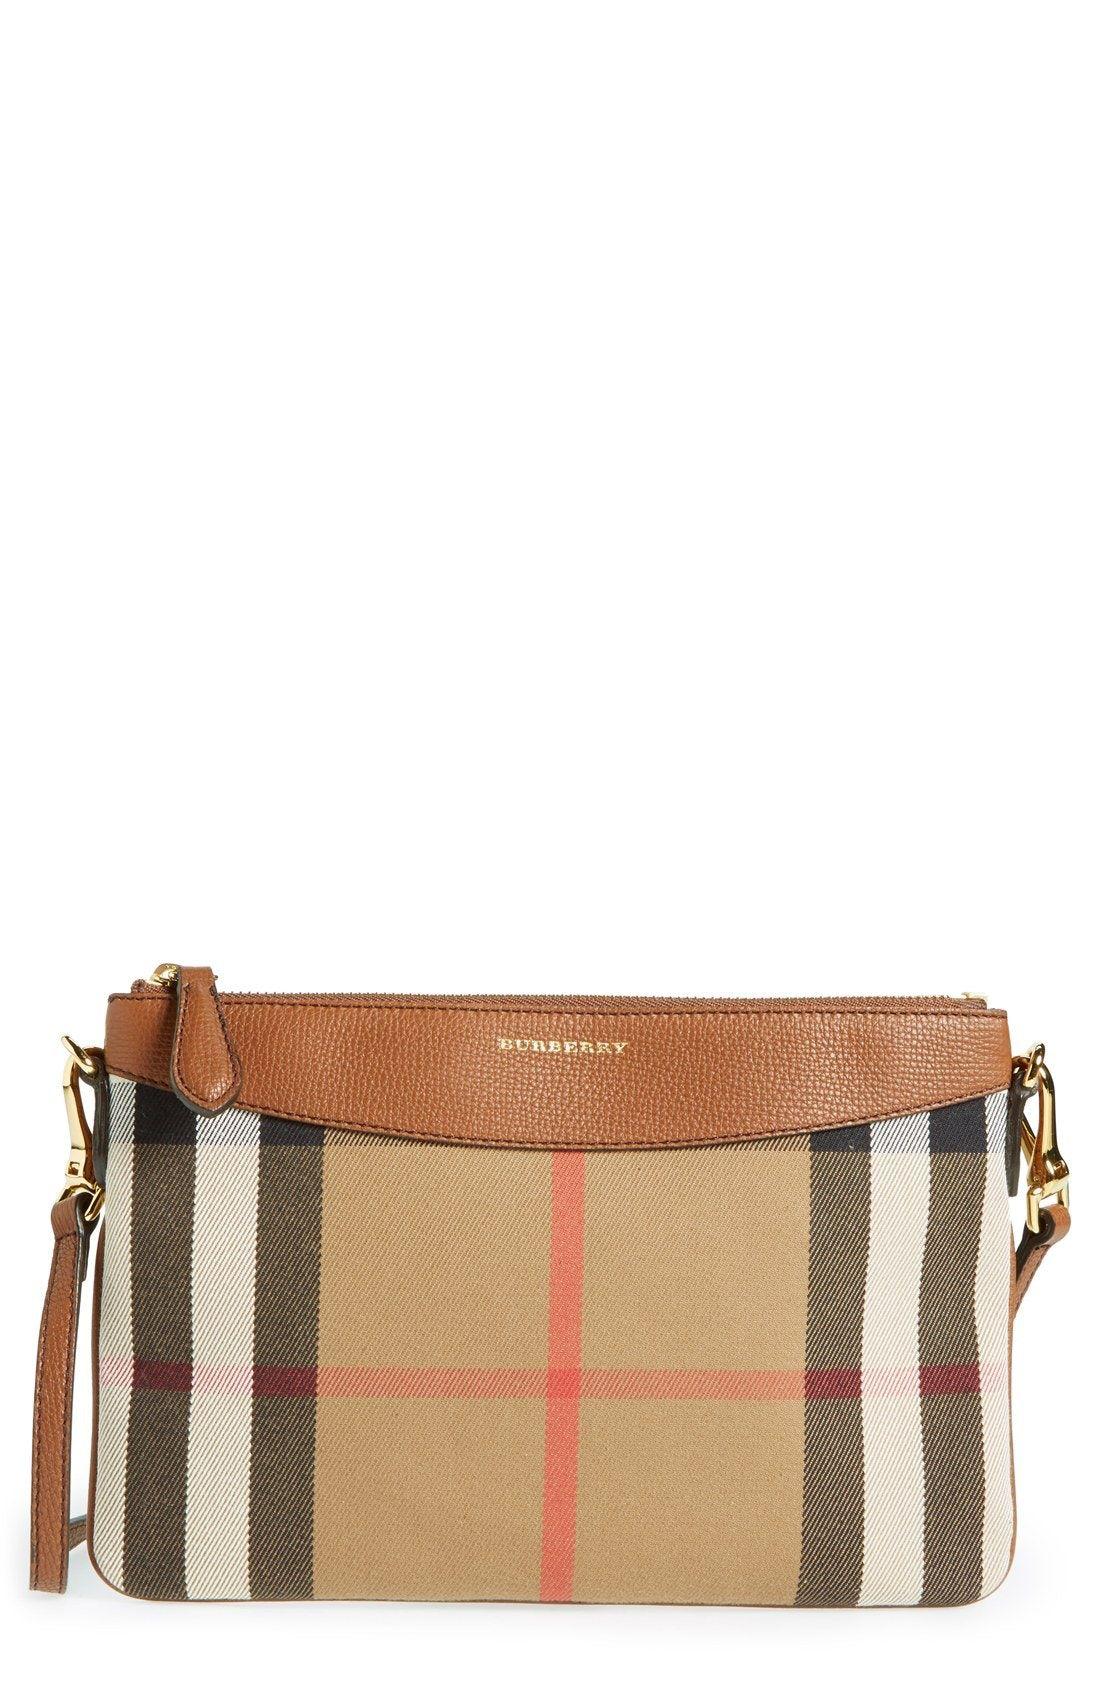 abbd7f9aa548 New Burberry Peyton - House Check Crossbody Bag fashion online.    625   shop.seehandbags